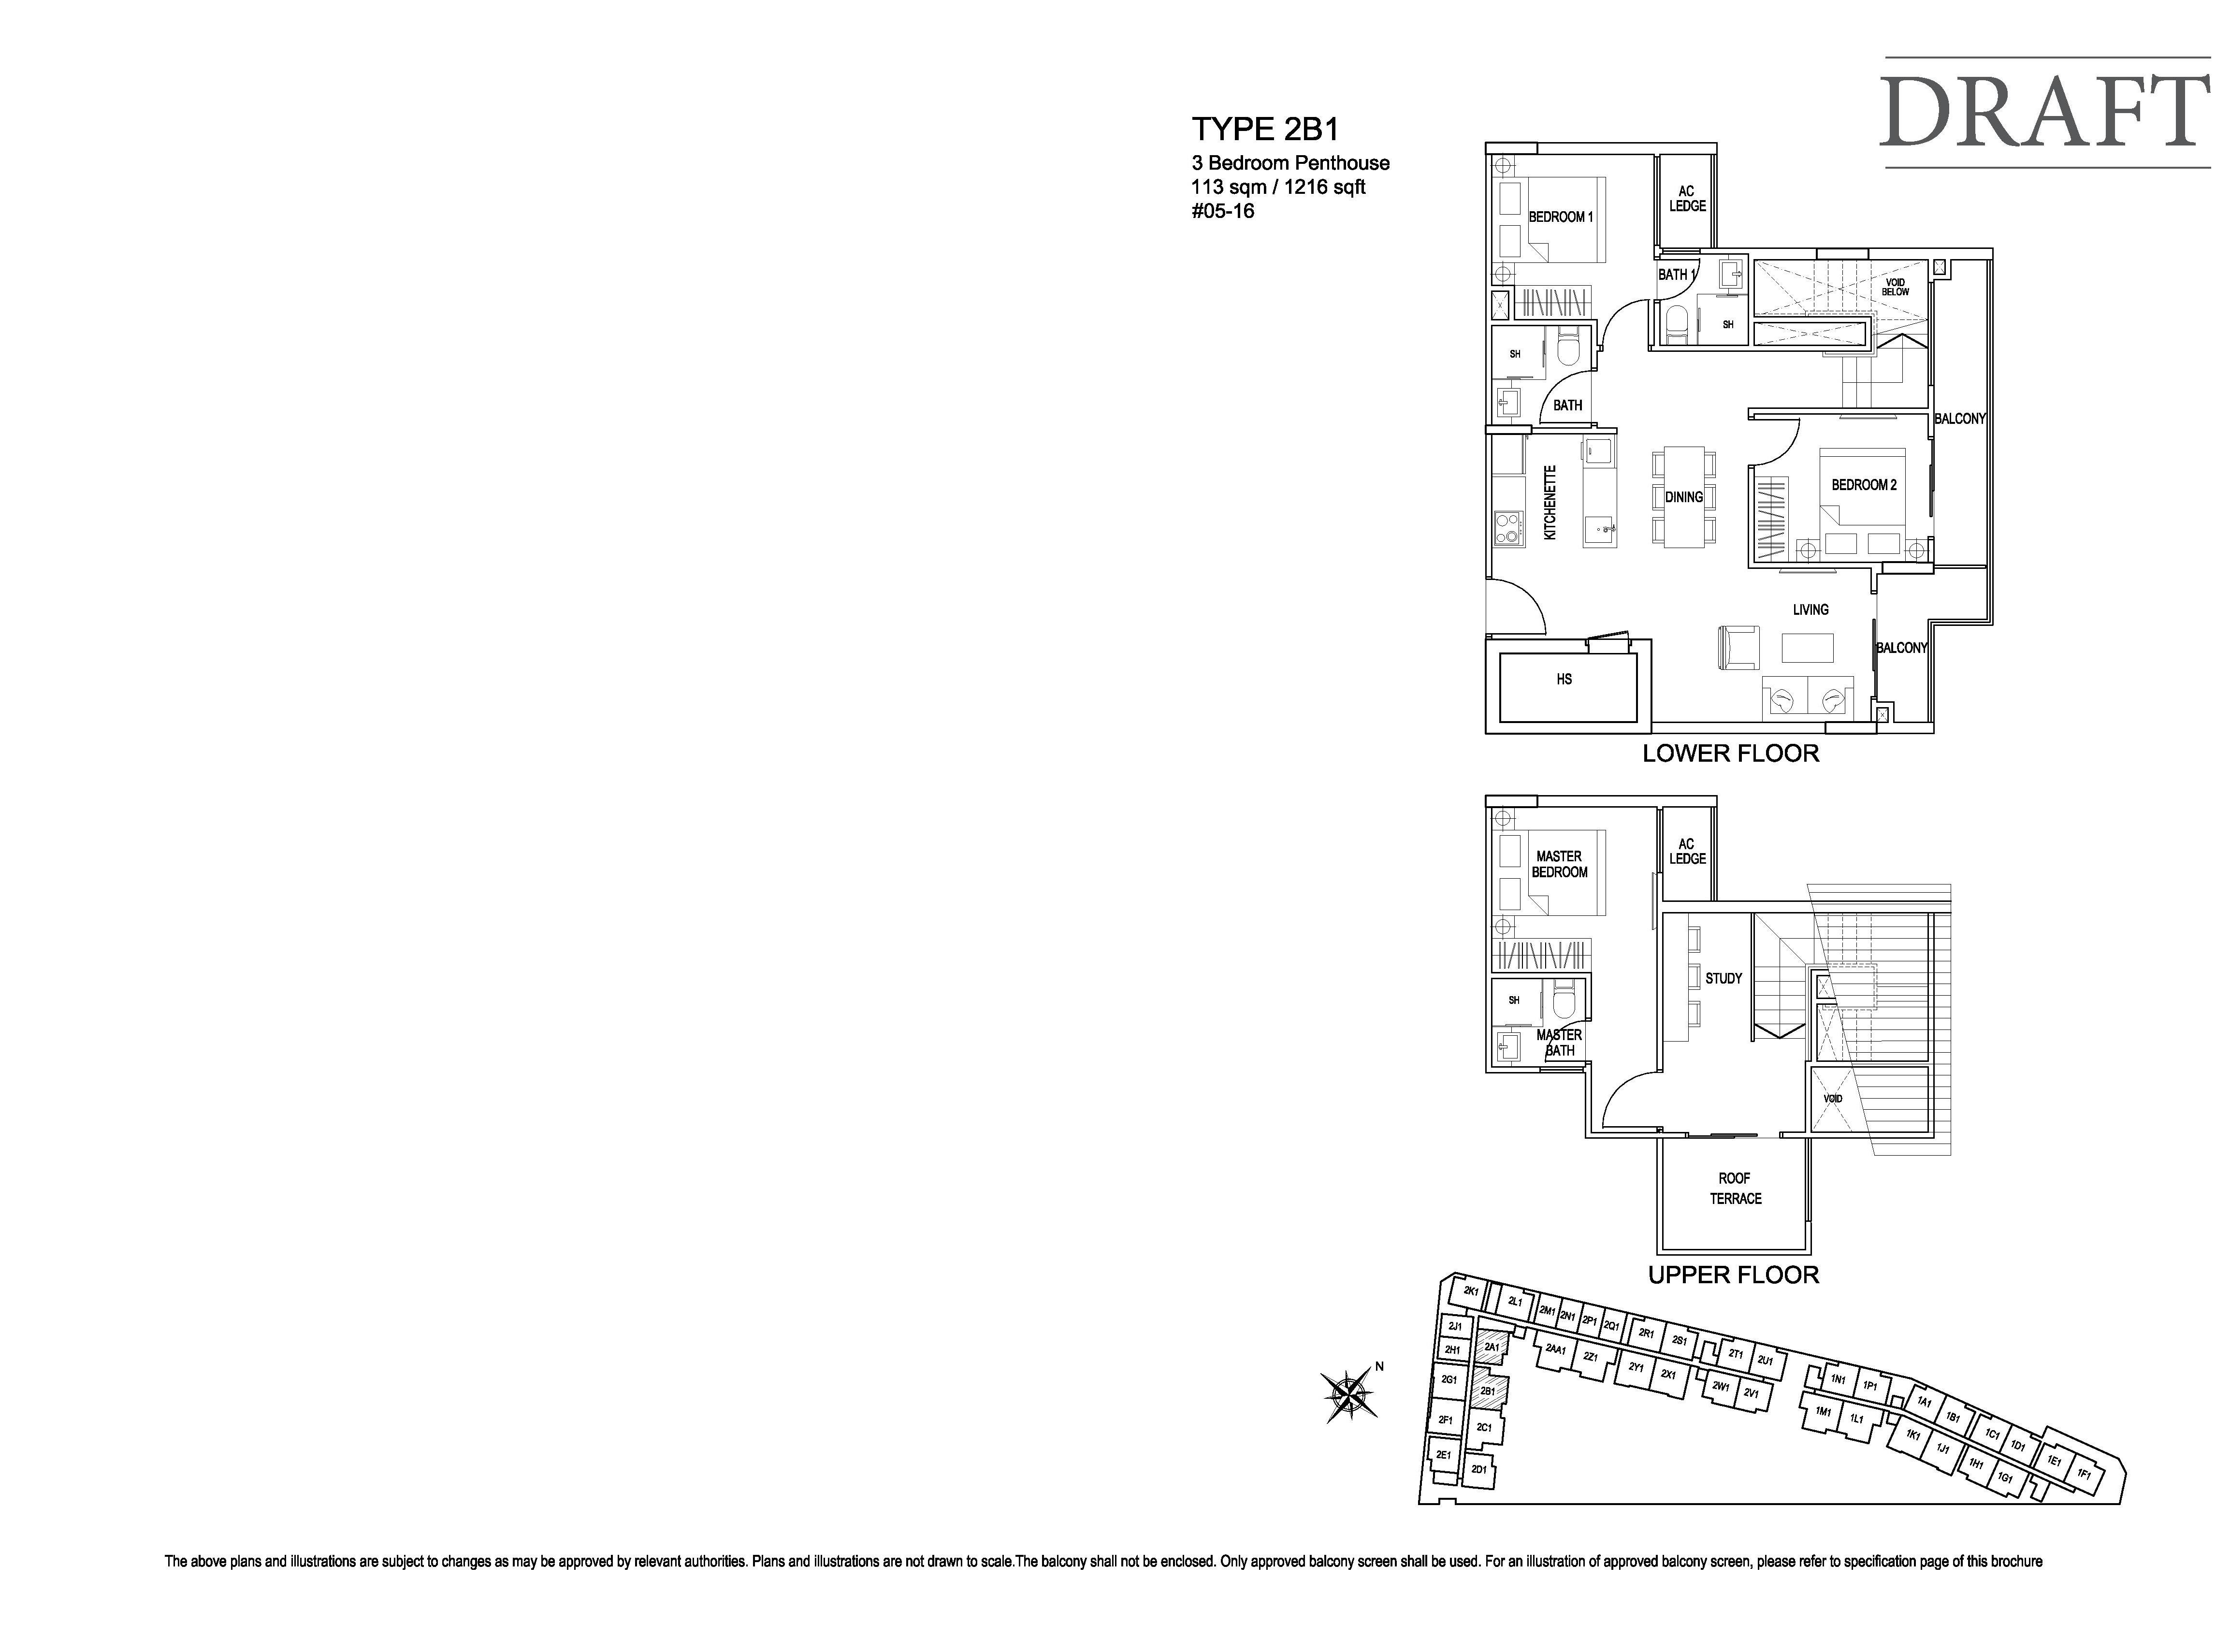 Kensington Square 3 Bedroom Penthouse Floor Plans Type 2B1